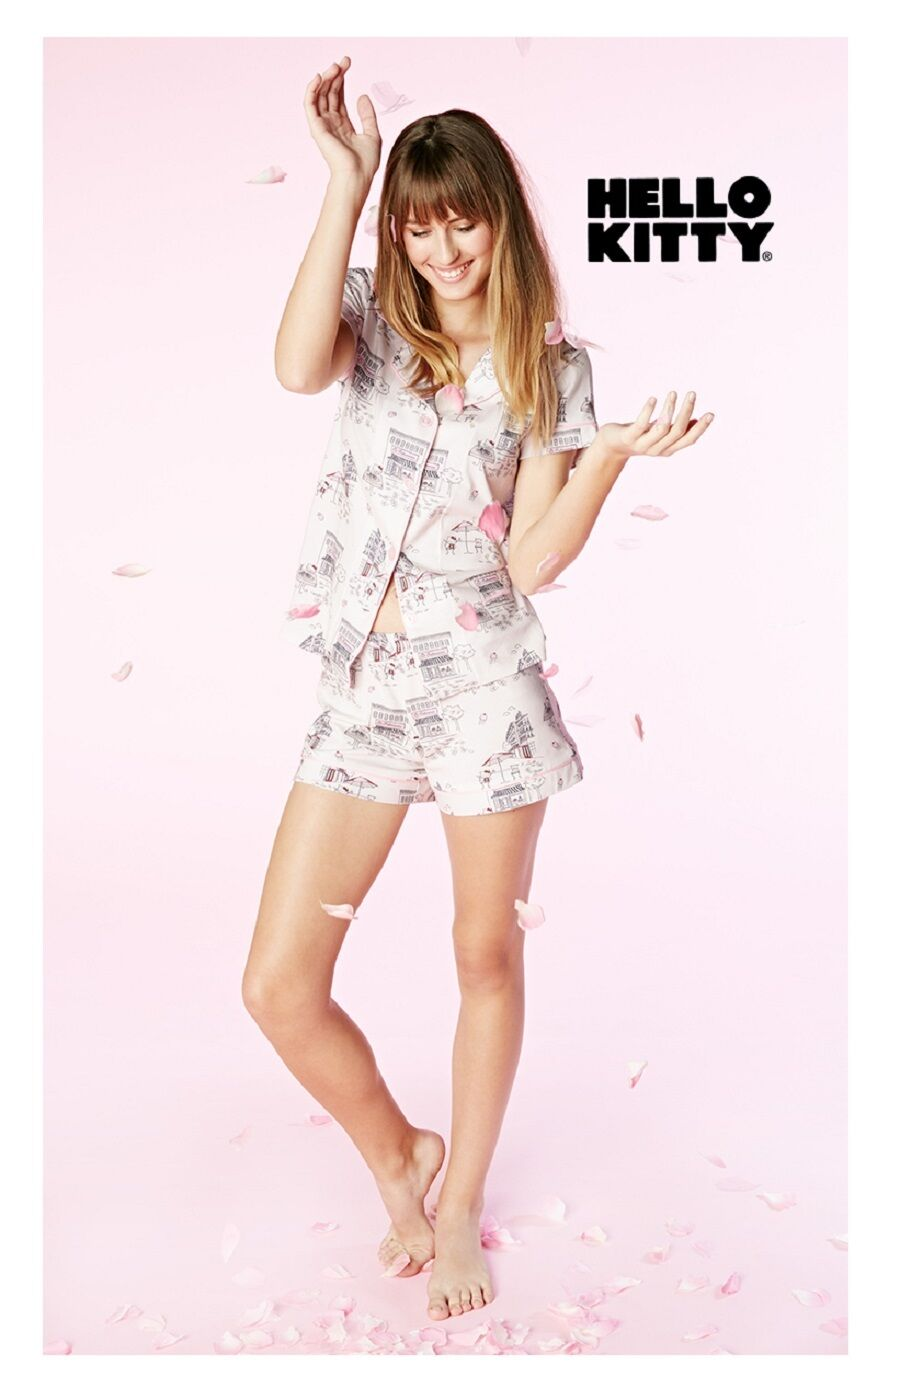 Bed Head Pajamas Hello Kitty Cafe Stretch S S Classic Shorty PJ Set 1093-S-4019